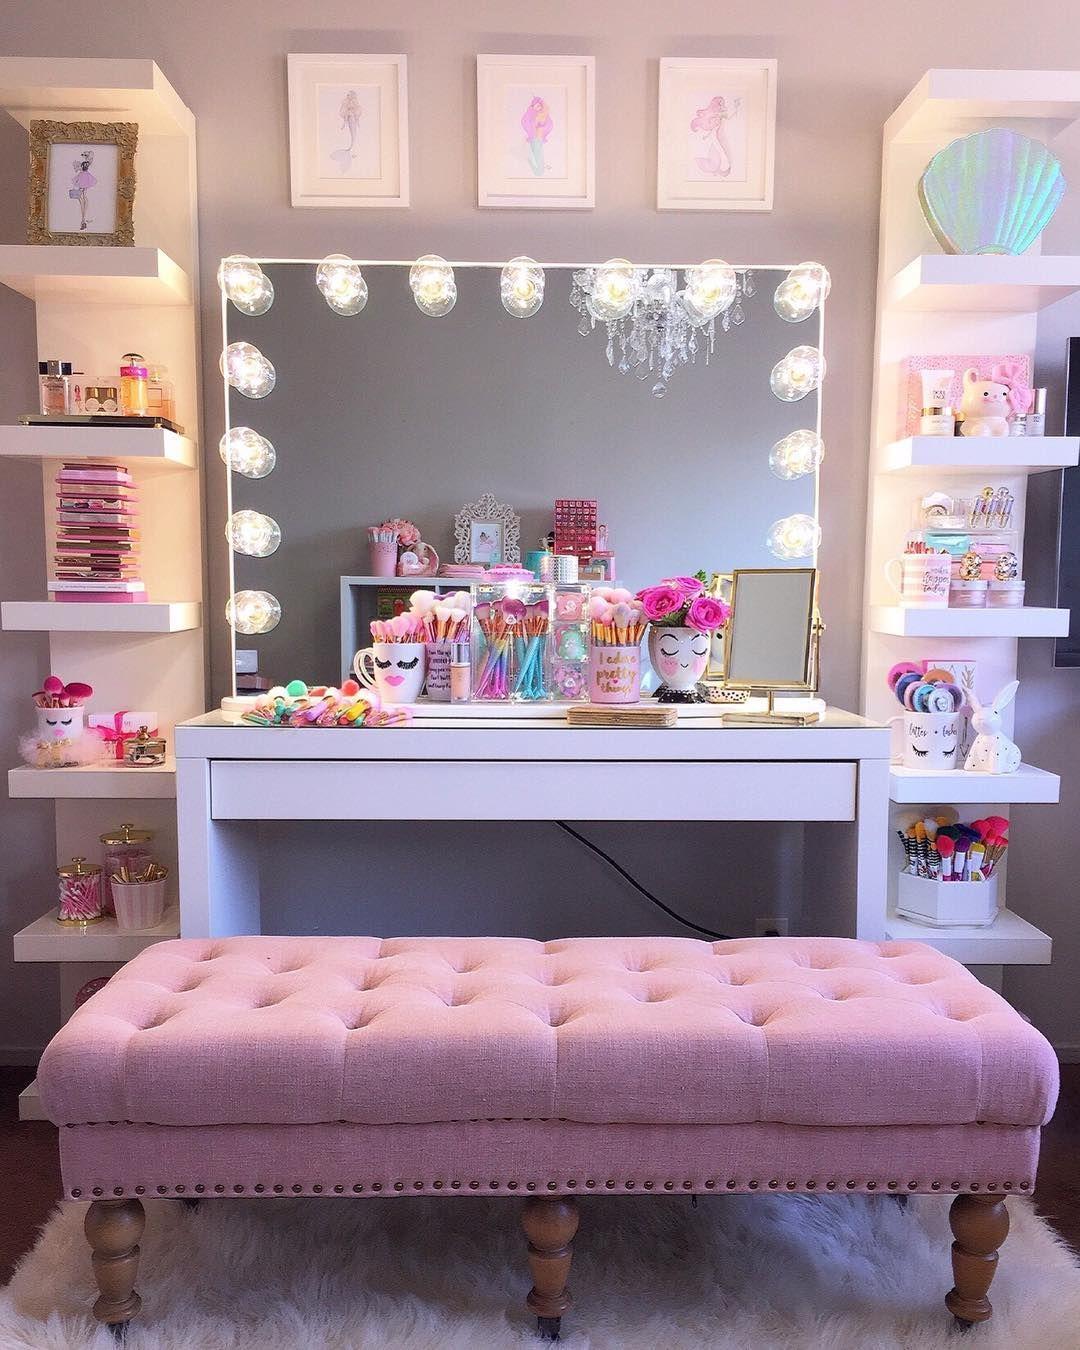 Bedroom Setup With Vanity